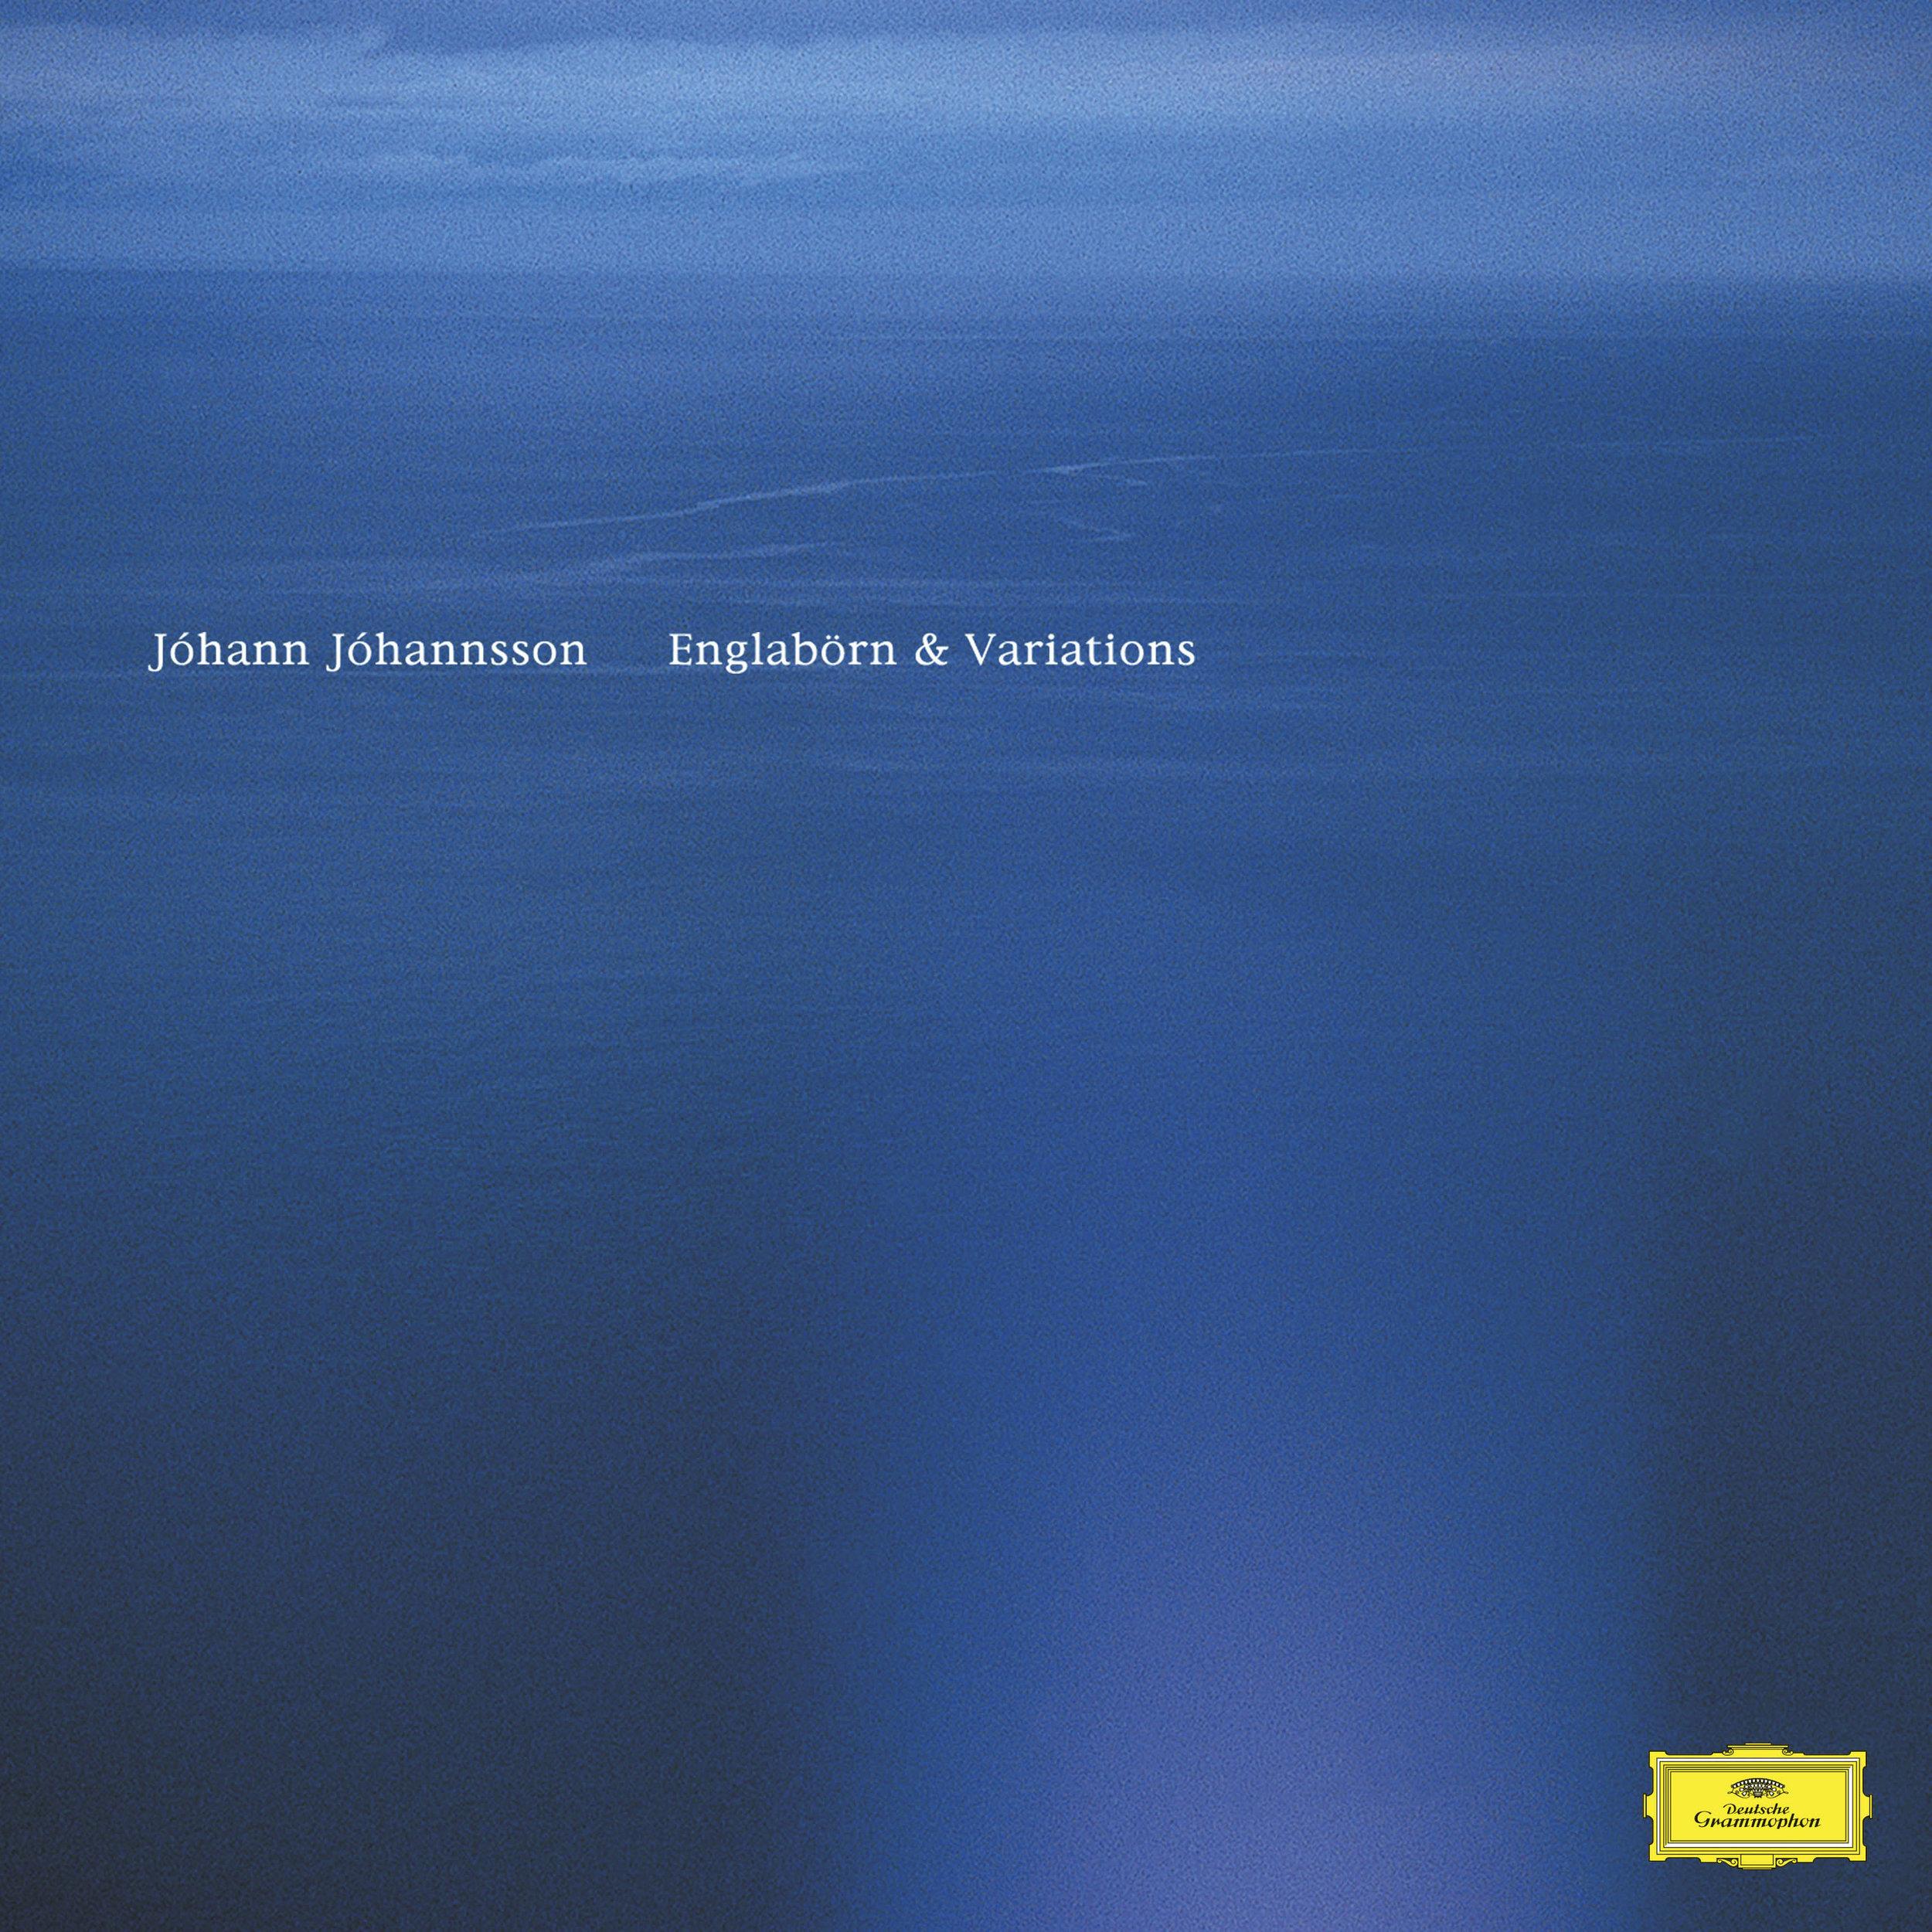 - Englabörn & VariationsJóhann Jóhannsson-- Programming, Musical Sound Design & Mix Engineer